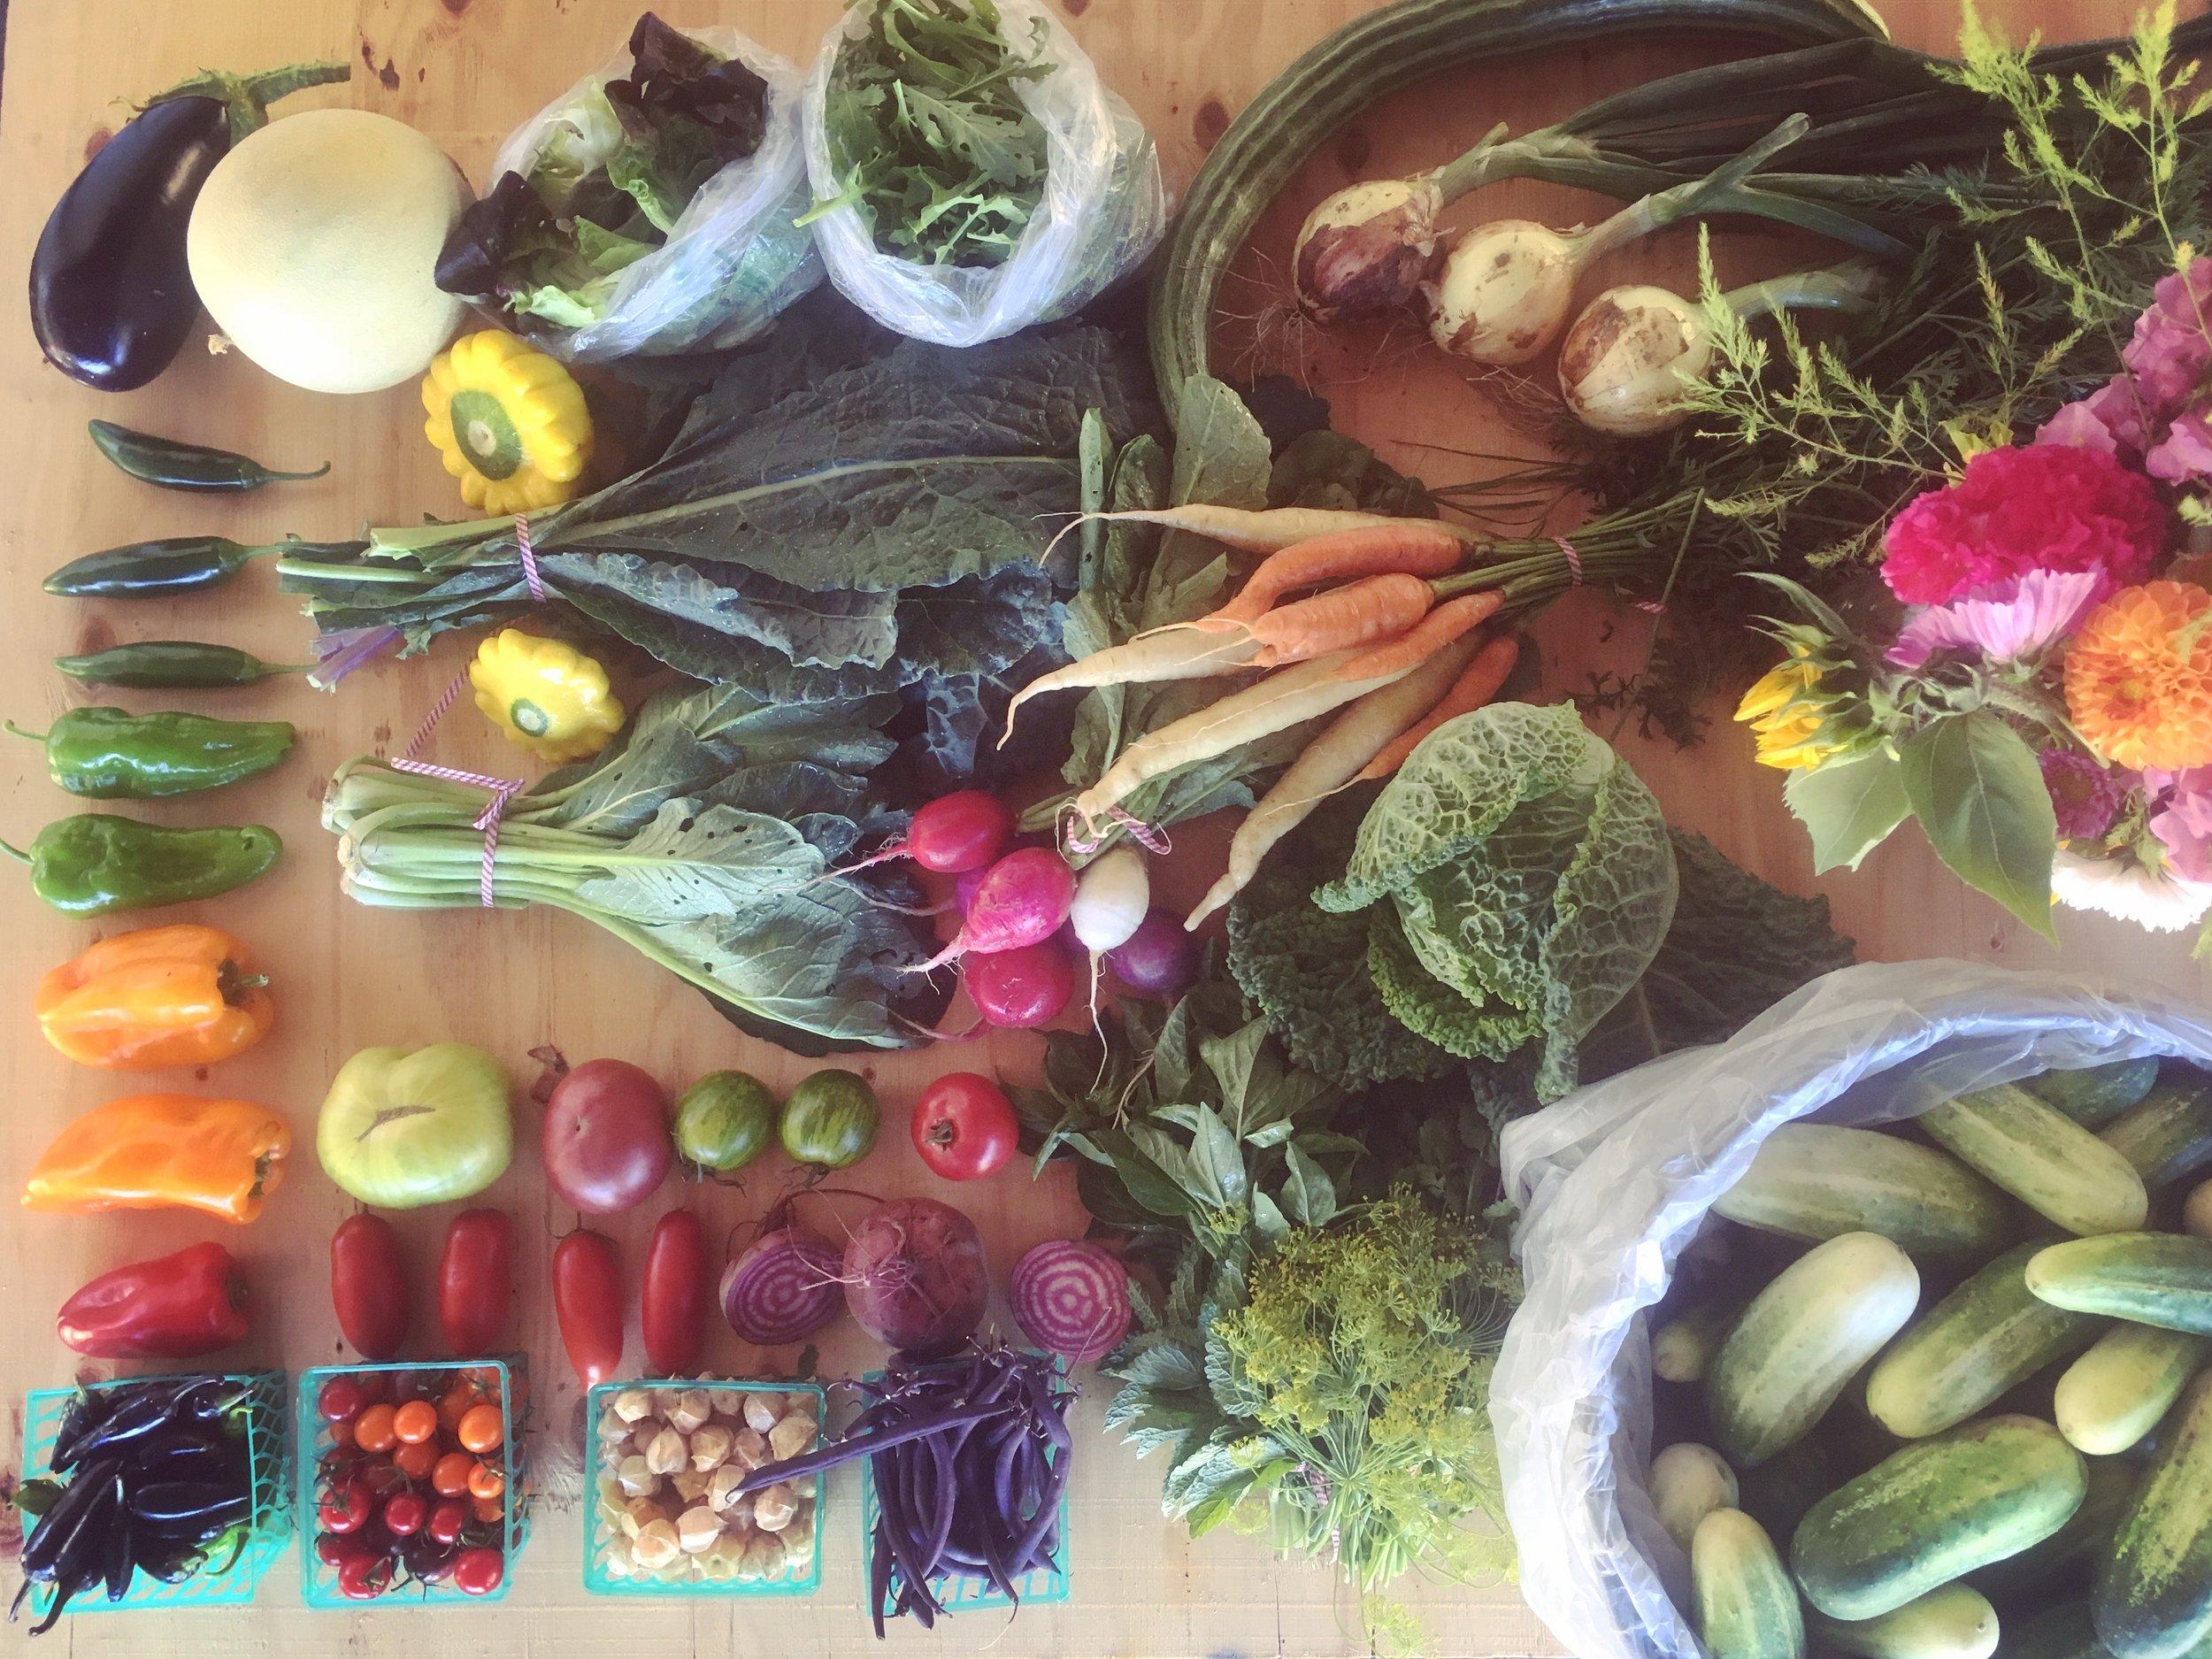 Week 9 sample harvest share